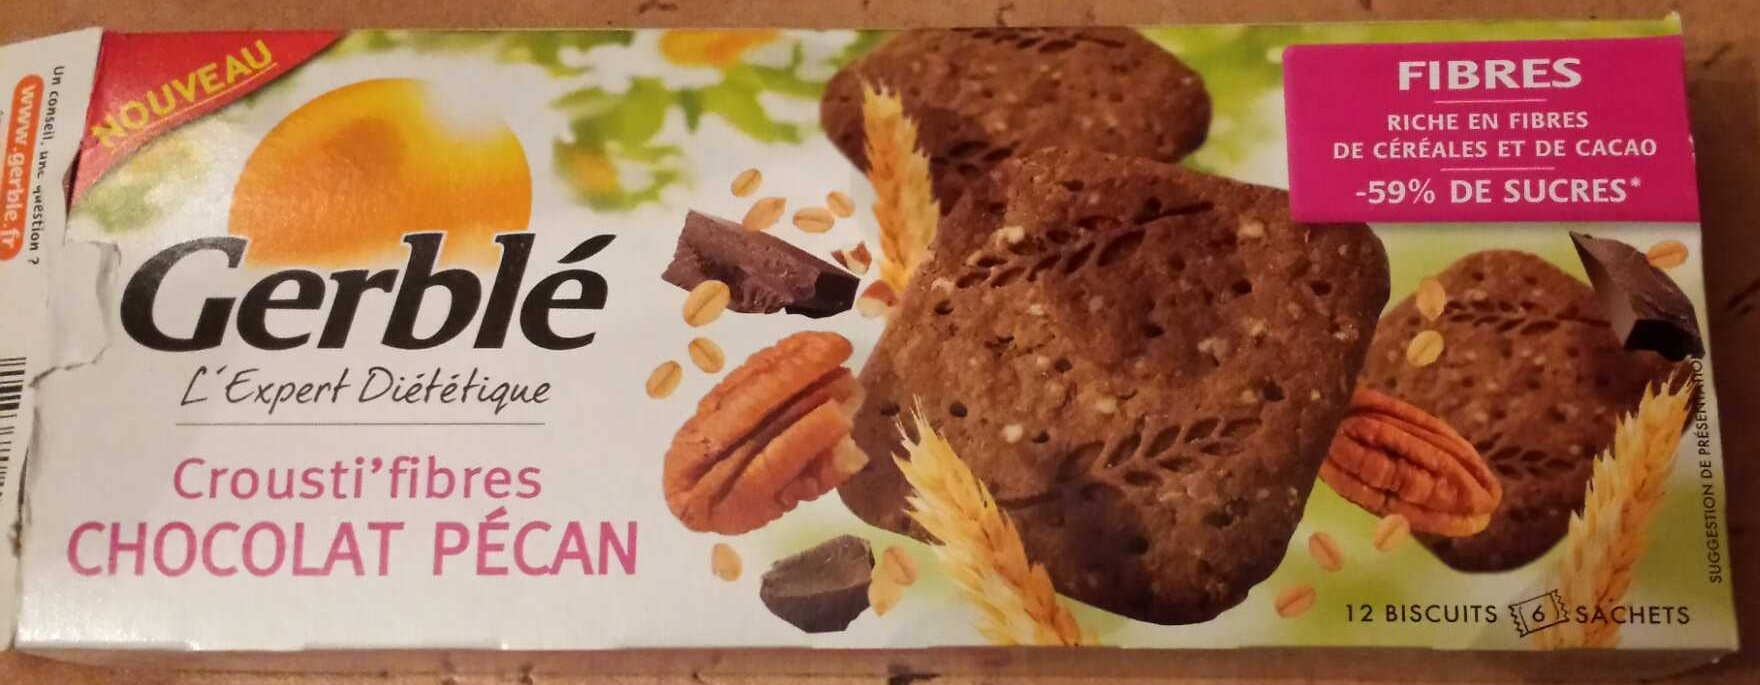 Crousti'fibres chocolat pécan - Product - fr